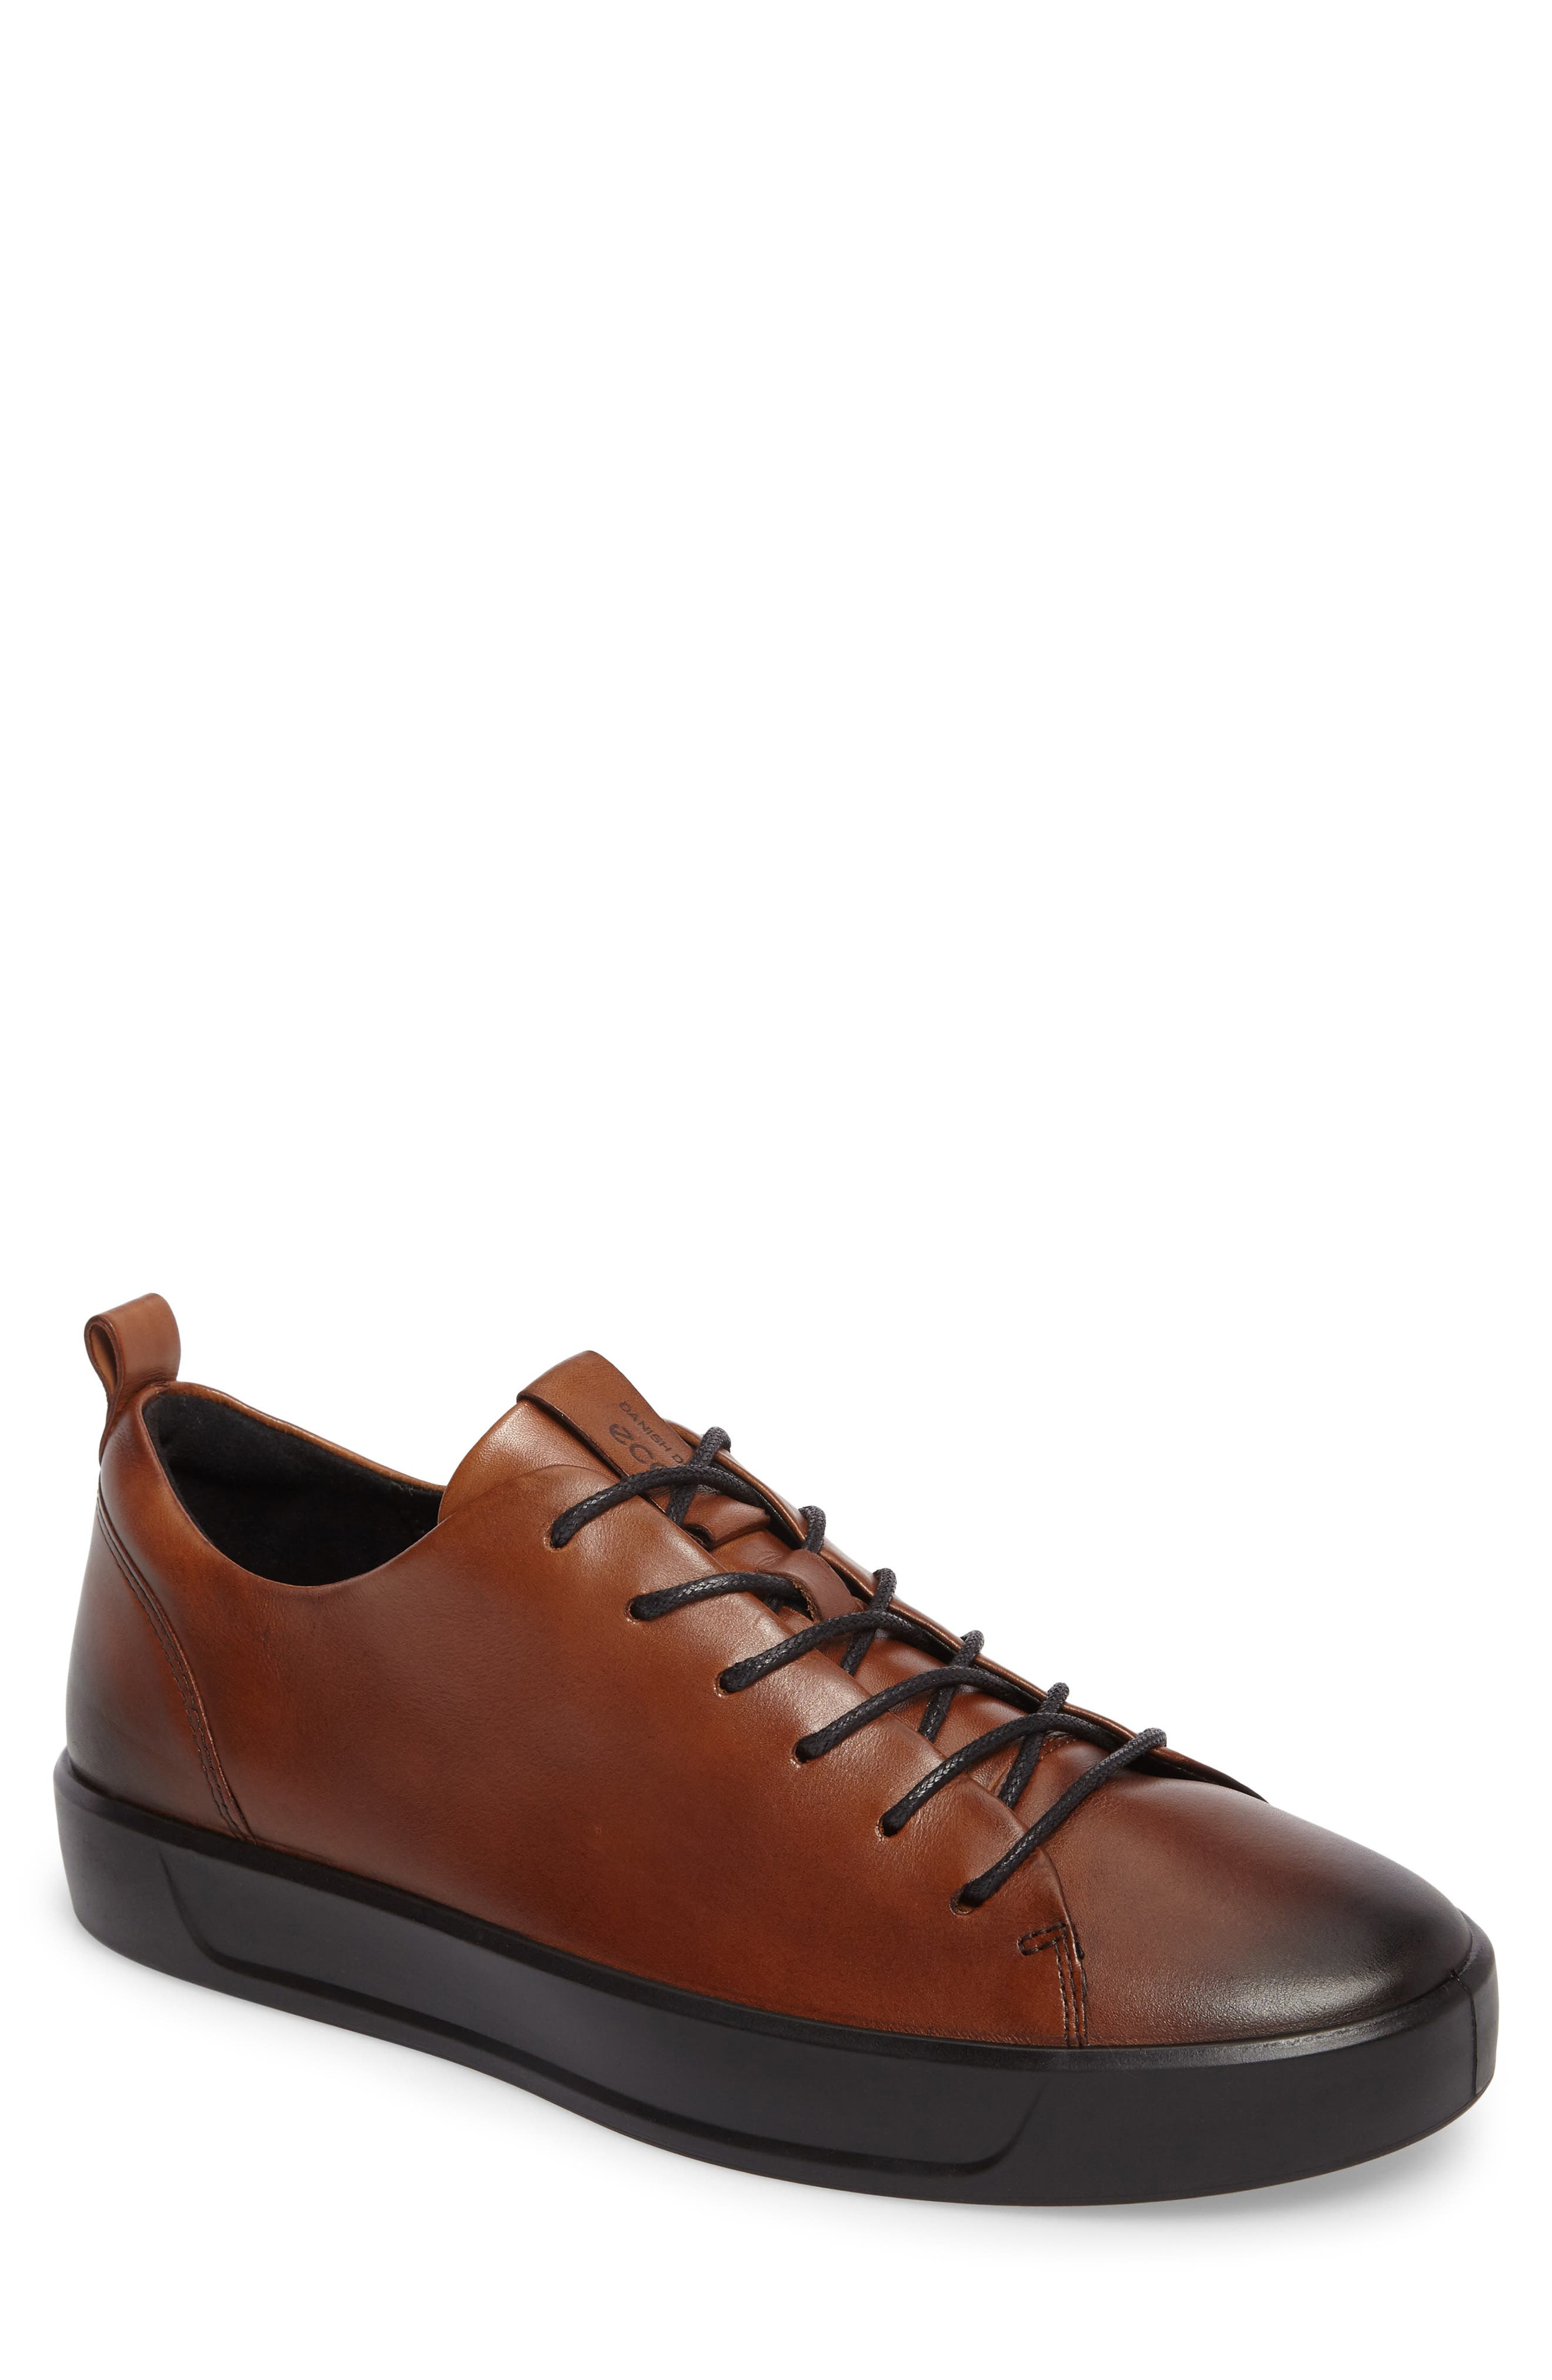 Alternate Image 1 Selected - ECCO Soft 8 Street Sneaker (Men)